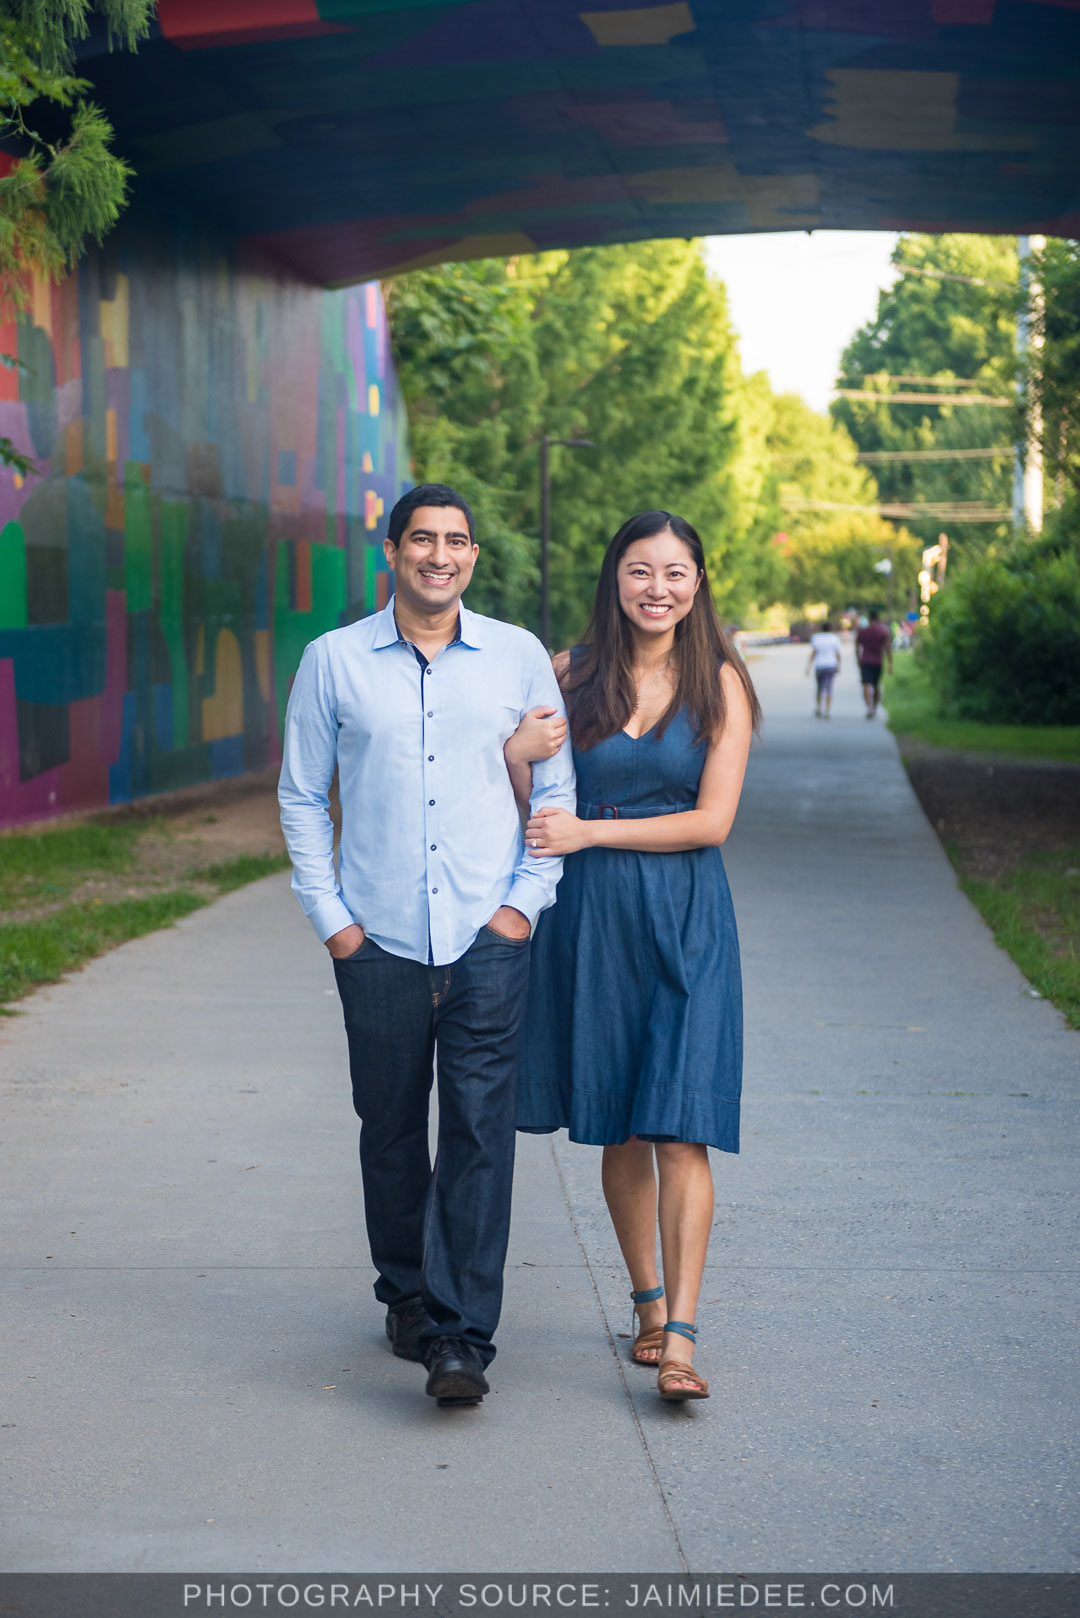 Atlanta-Beltline-engagement-photos-couple-walking